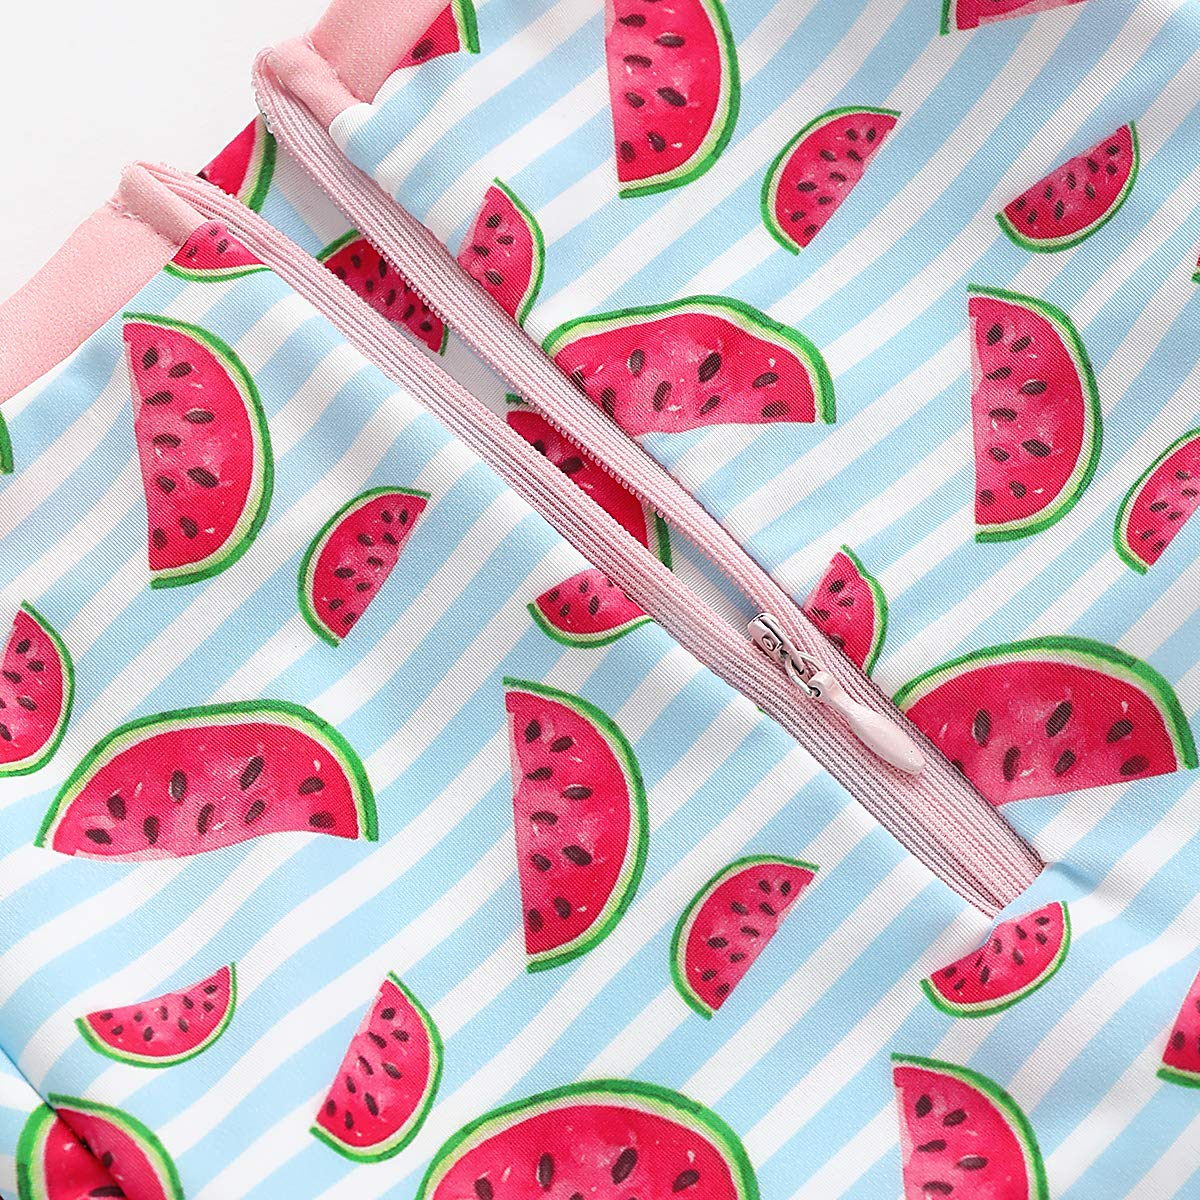 Xiao Reddou Baby//Toddler Girls Summer Beach Romper Long Sleeve One Piece Swimsuit with Zipper